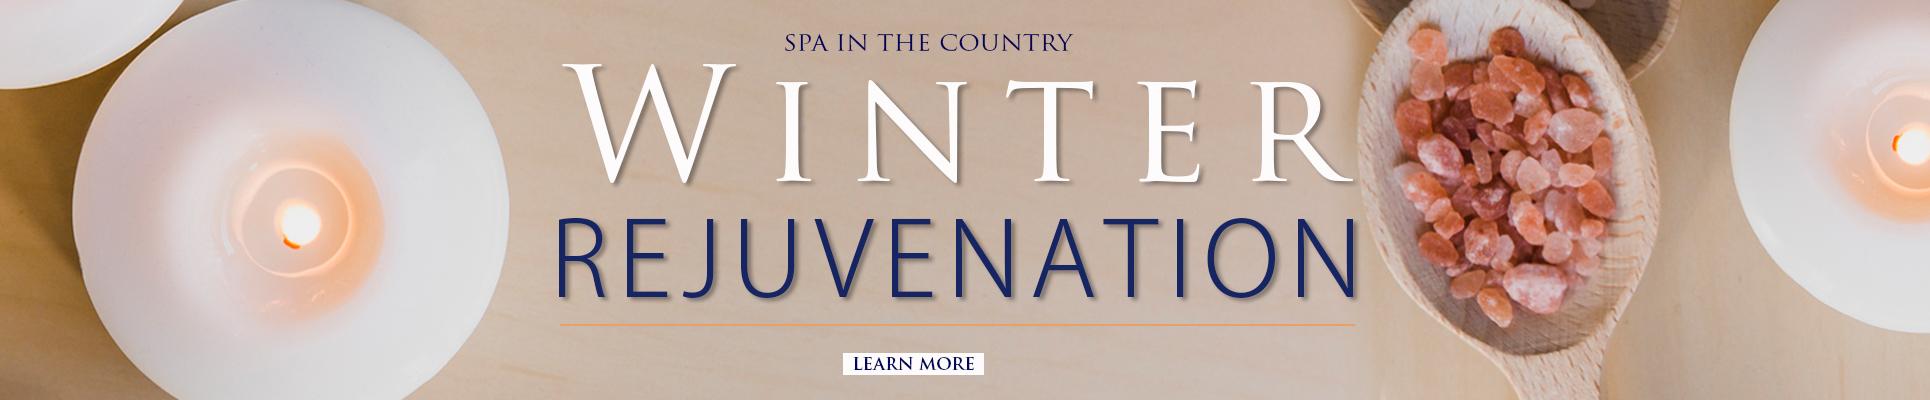 Spa in the Country Winter Specials - Muldersdrift, Gauteng - Rustenburg spa